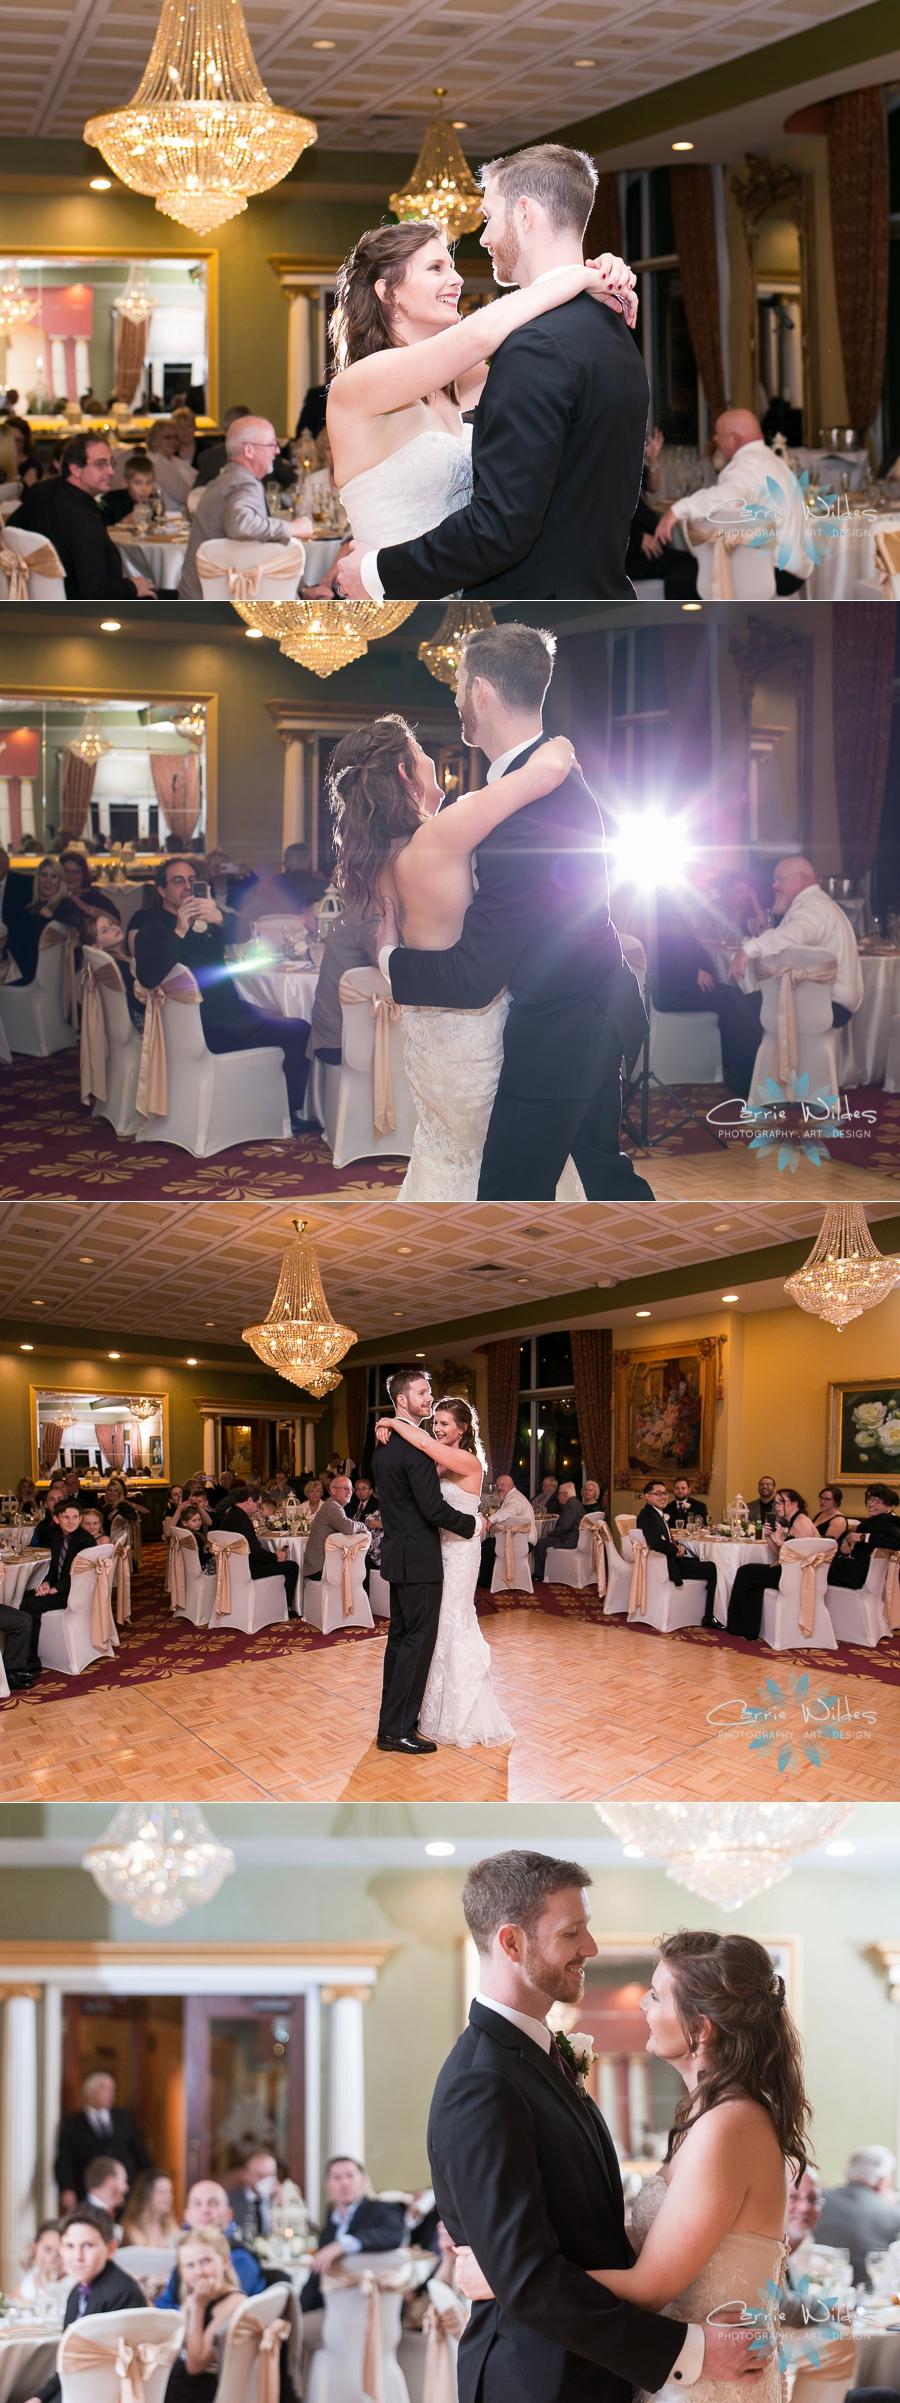 1_19_19 Alyx and Billy Safety Harbor Resort Wedding 00031.jpg